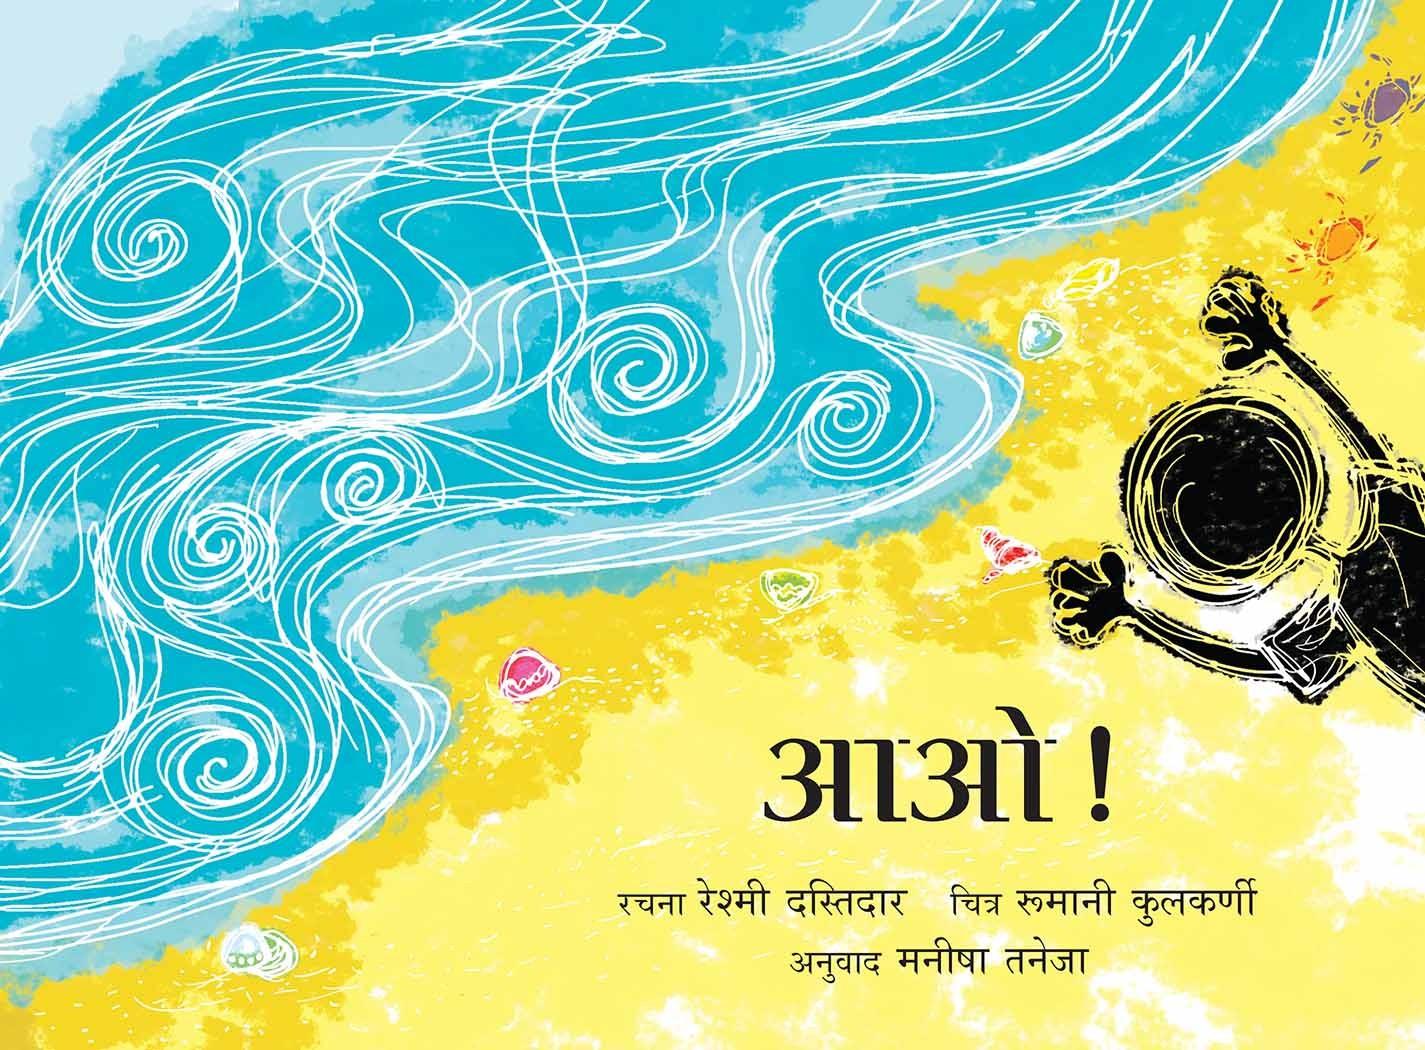 Come!/Aao! (Hindi)